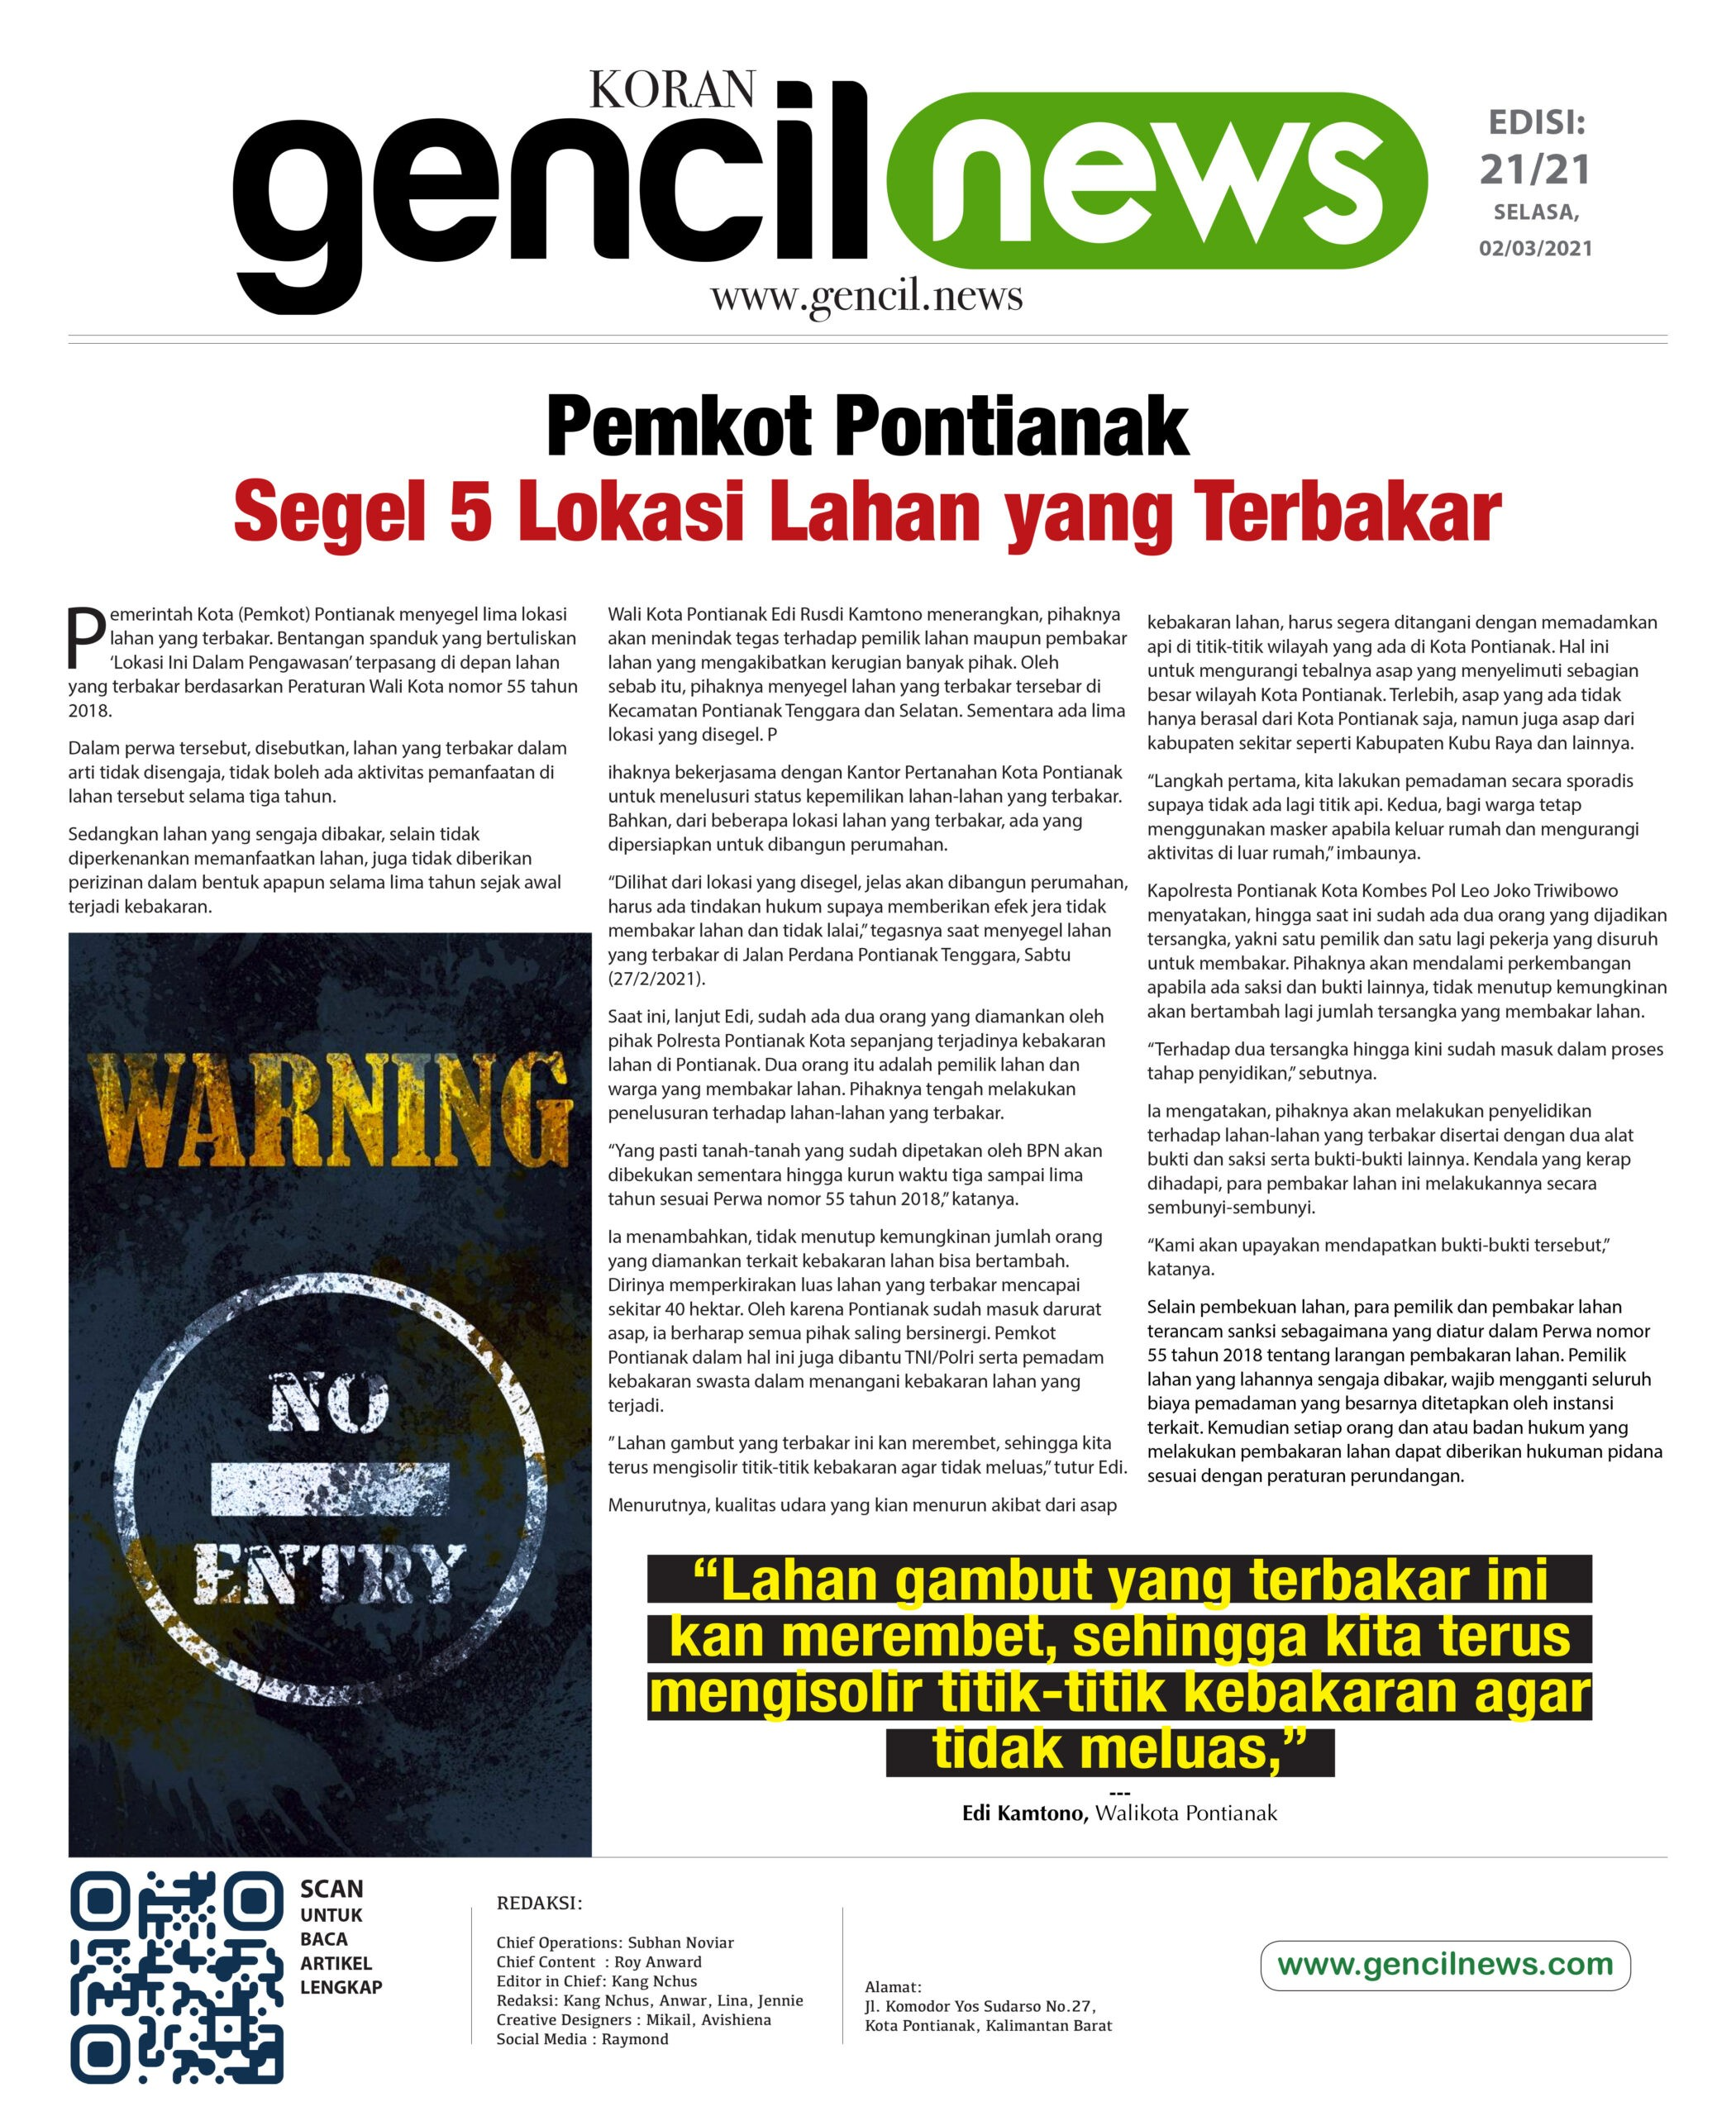 Koran Gencil News - Lahan Terbakar Disegel Pemkot Pontianak